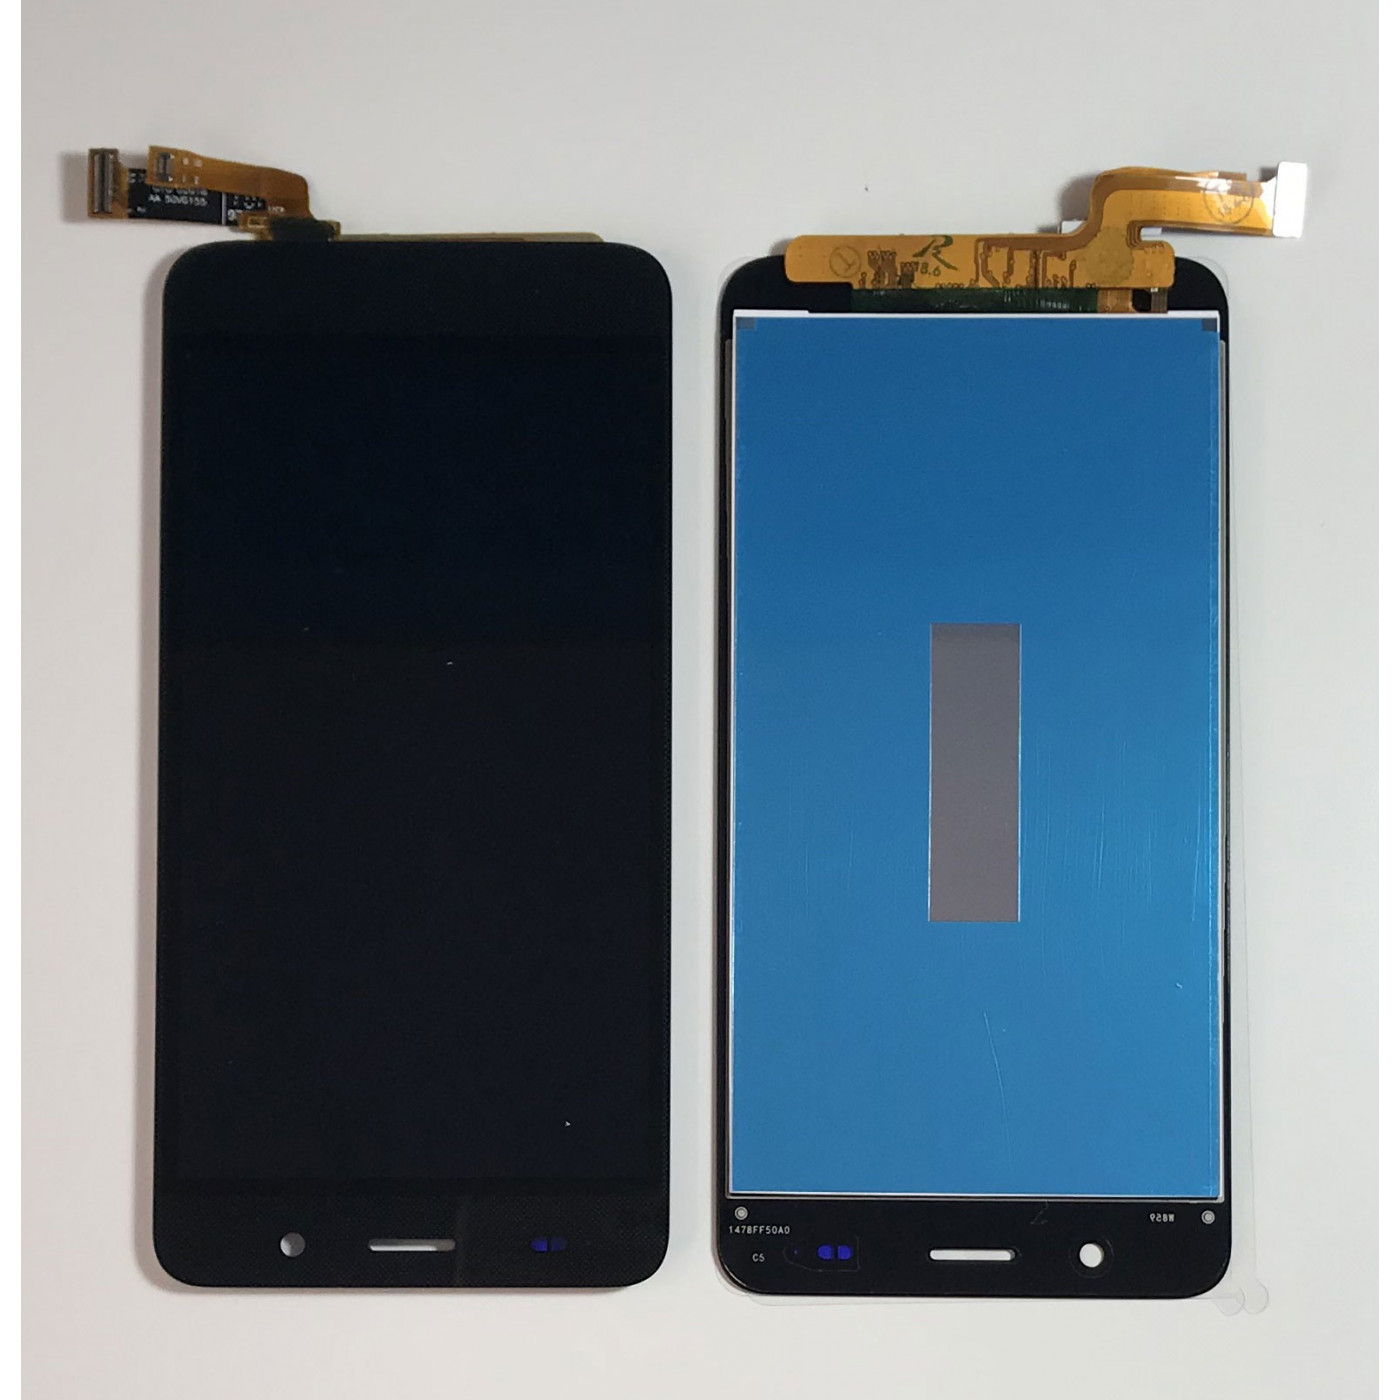 PANTALLA TÁCTIL DE CRISTAL + PANTALLA LCD ENSAMBLADA para Huawei Ascend Y6 NEGRO